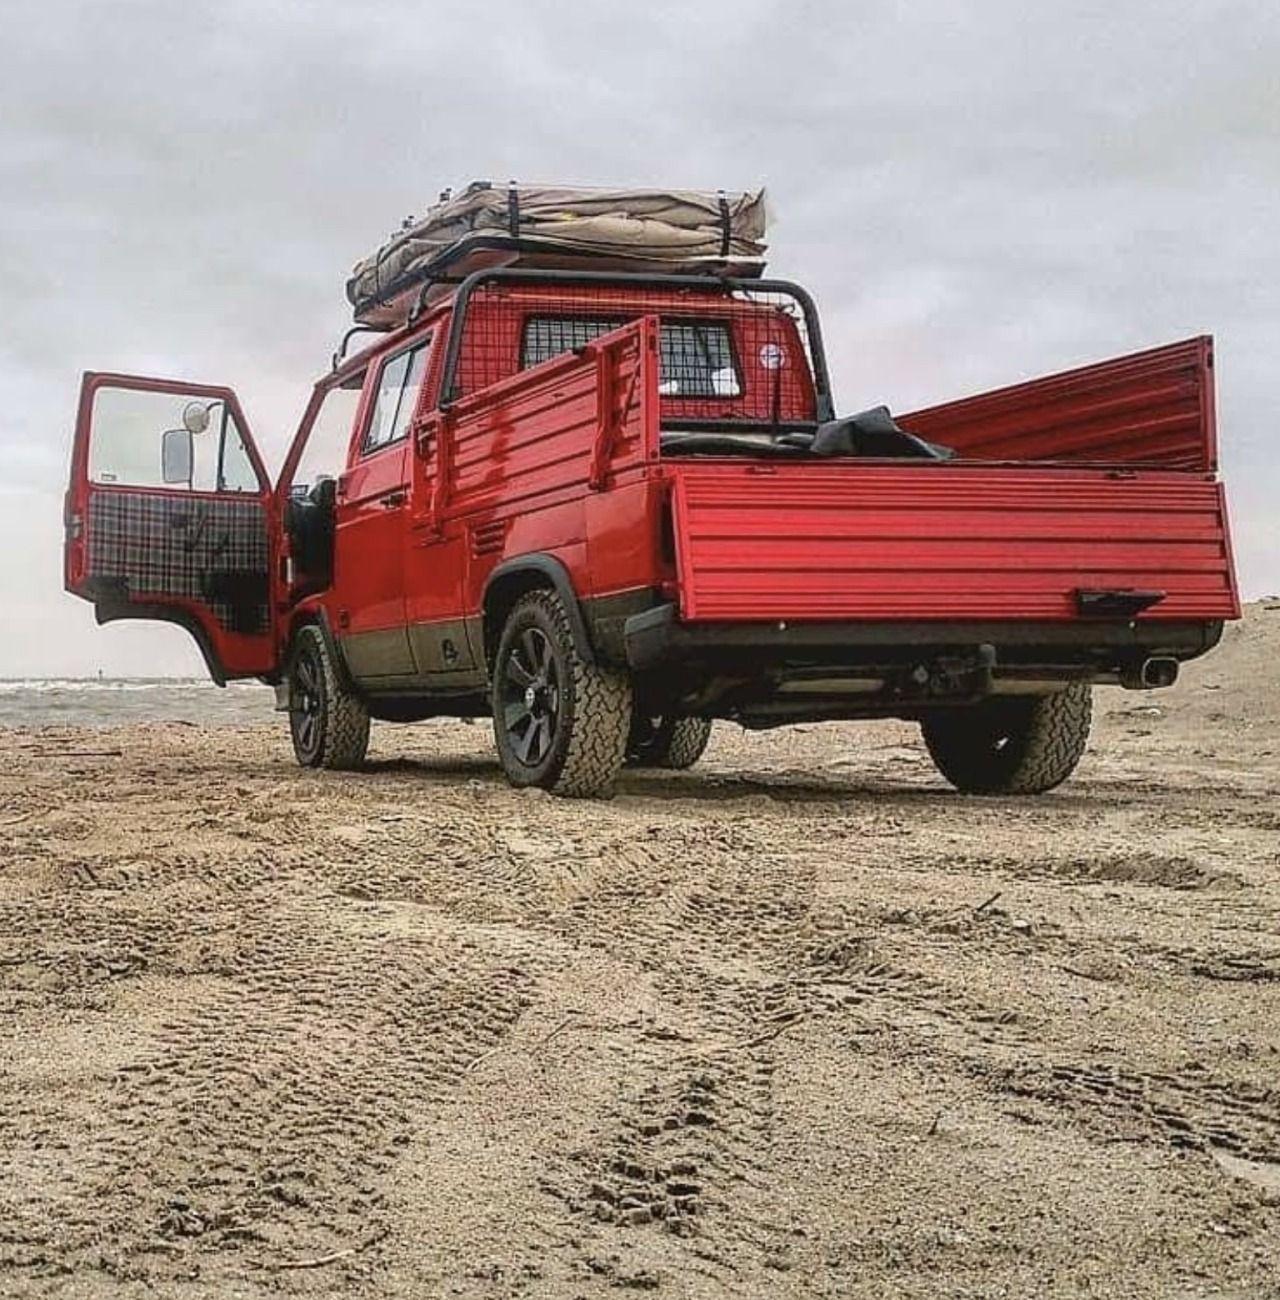 vanderlust in 2020 Mini trucks, Syncros, Vw doka